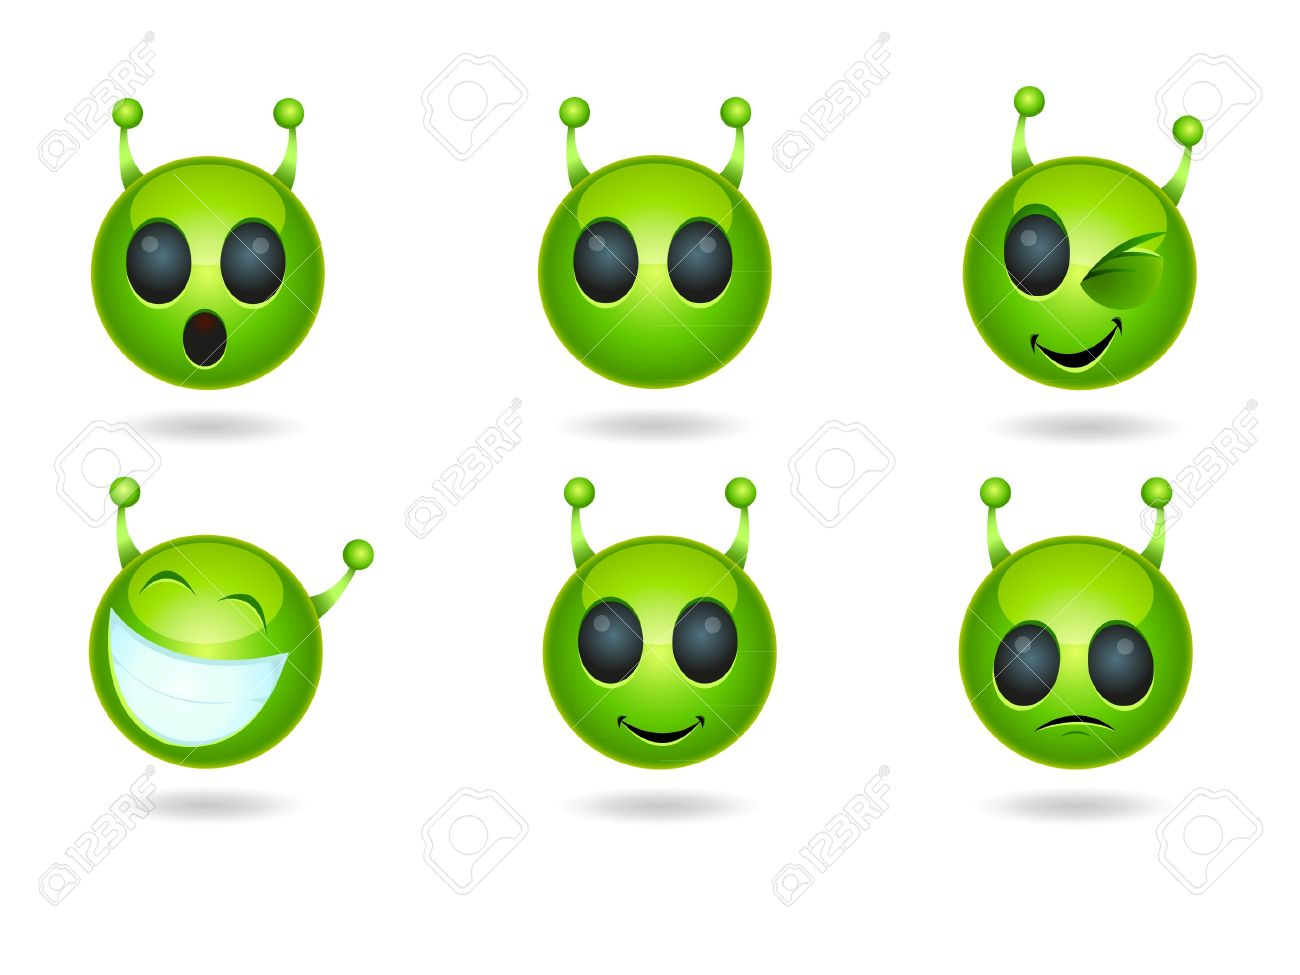 alien cartoon stock photos royalty free alien cartoon images and